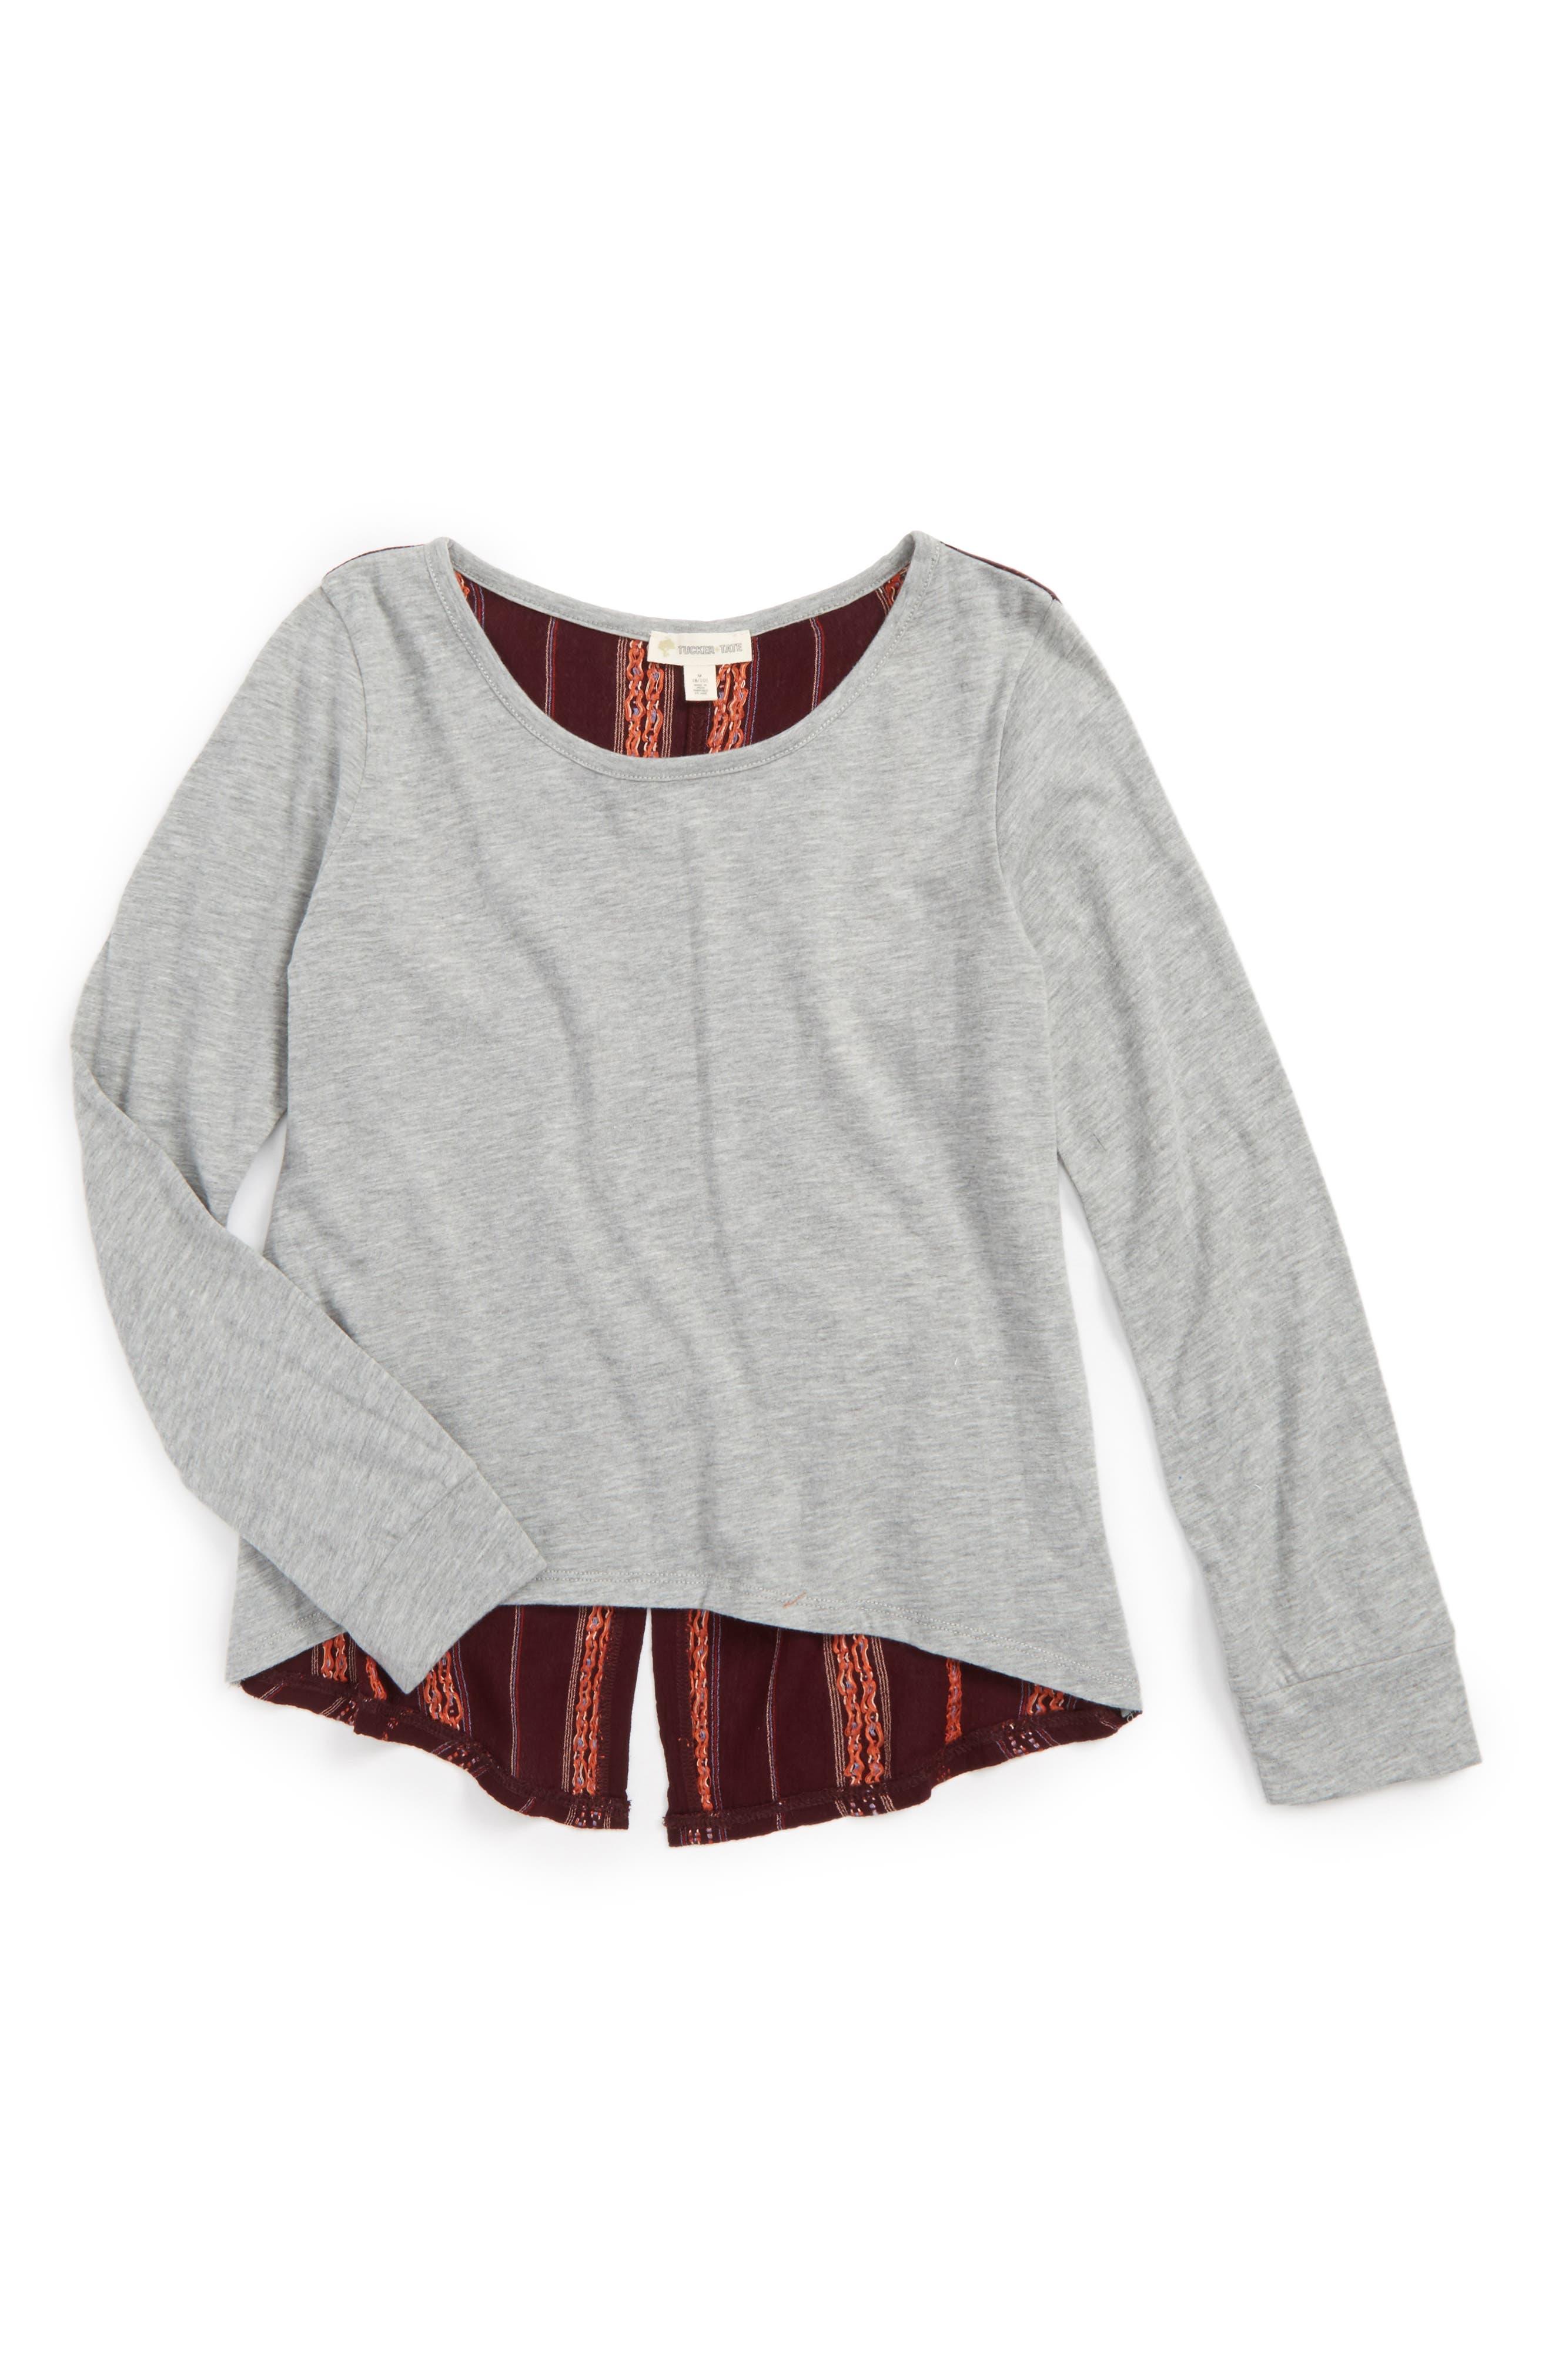 Main Image - Tucker + Tate Embroidered Back Shirt (Big Girls)